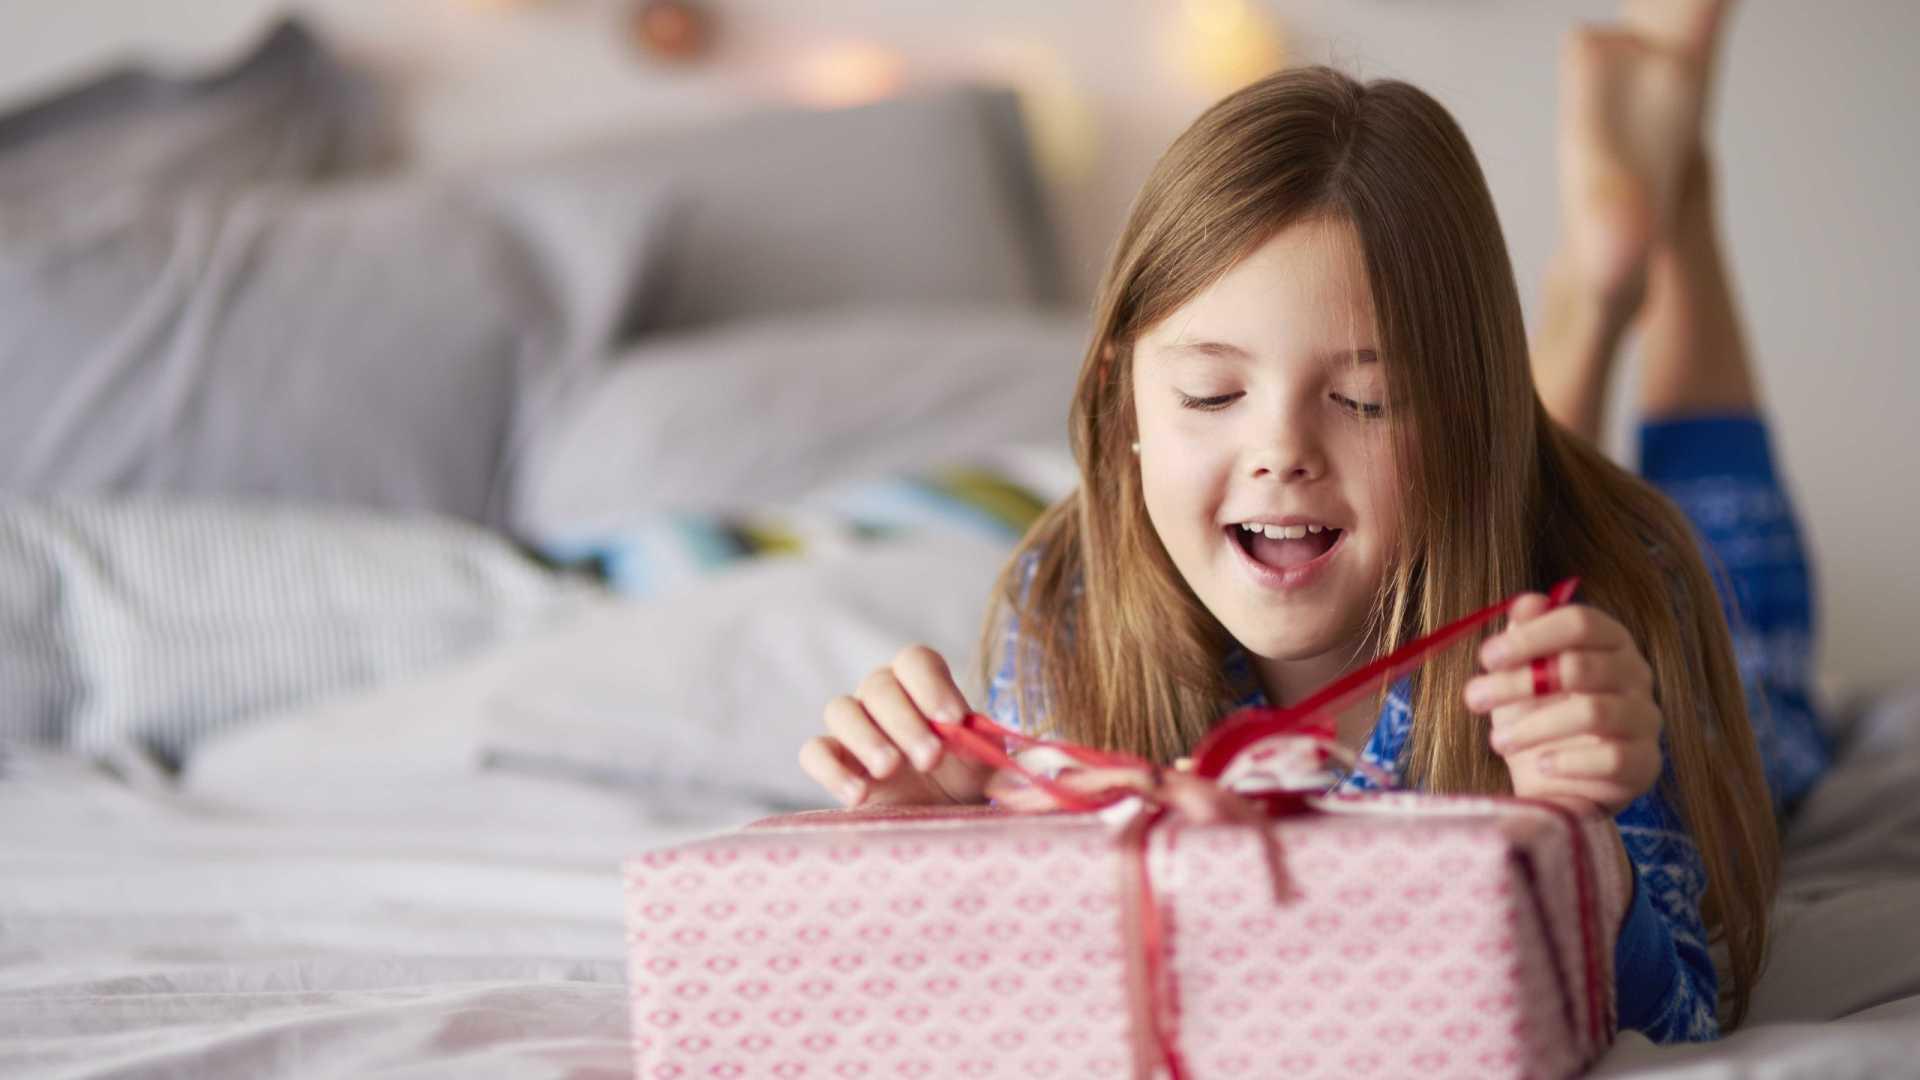 Sociedade Brasileira de pediatria alerta pais sobre presentes de Natal